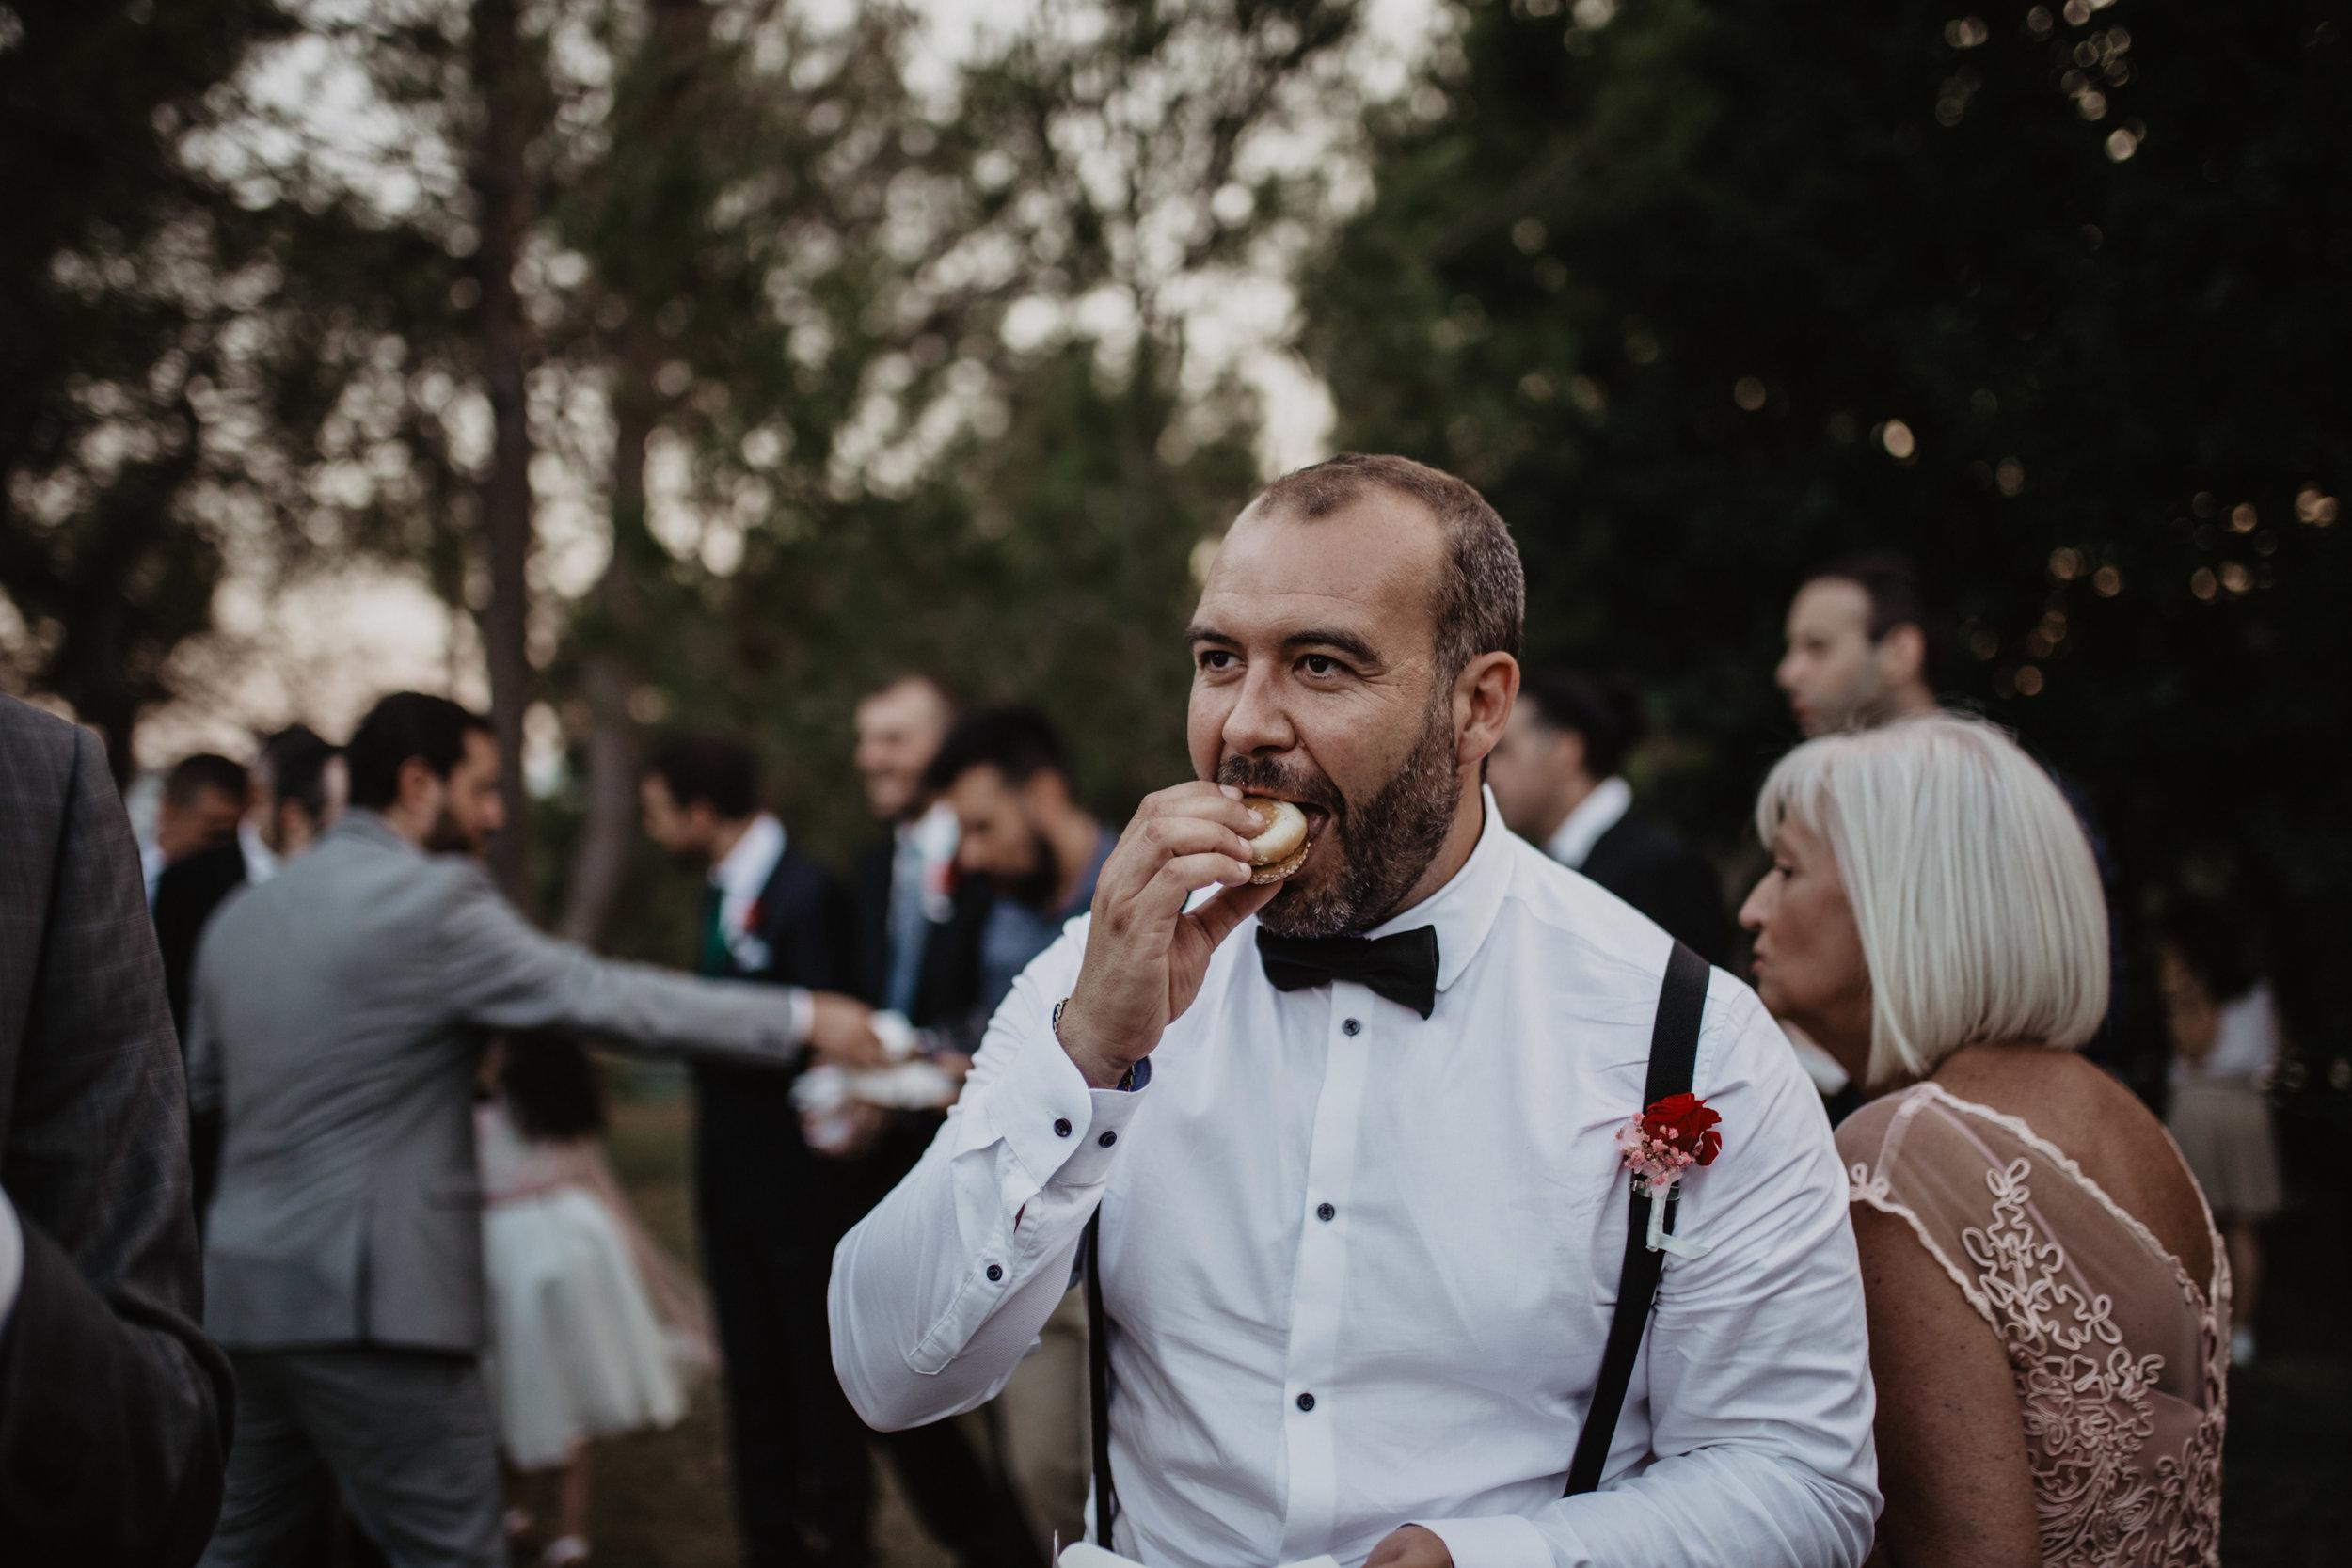 thenortherngirlphotography_photography_thenortherngirl_rebeccascabros_wedding_weddingphotography_masialagarrigadecastelladral_joaniemma_bodaenbarcelona_weddingphotographer_emmaijoan-653.jpg